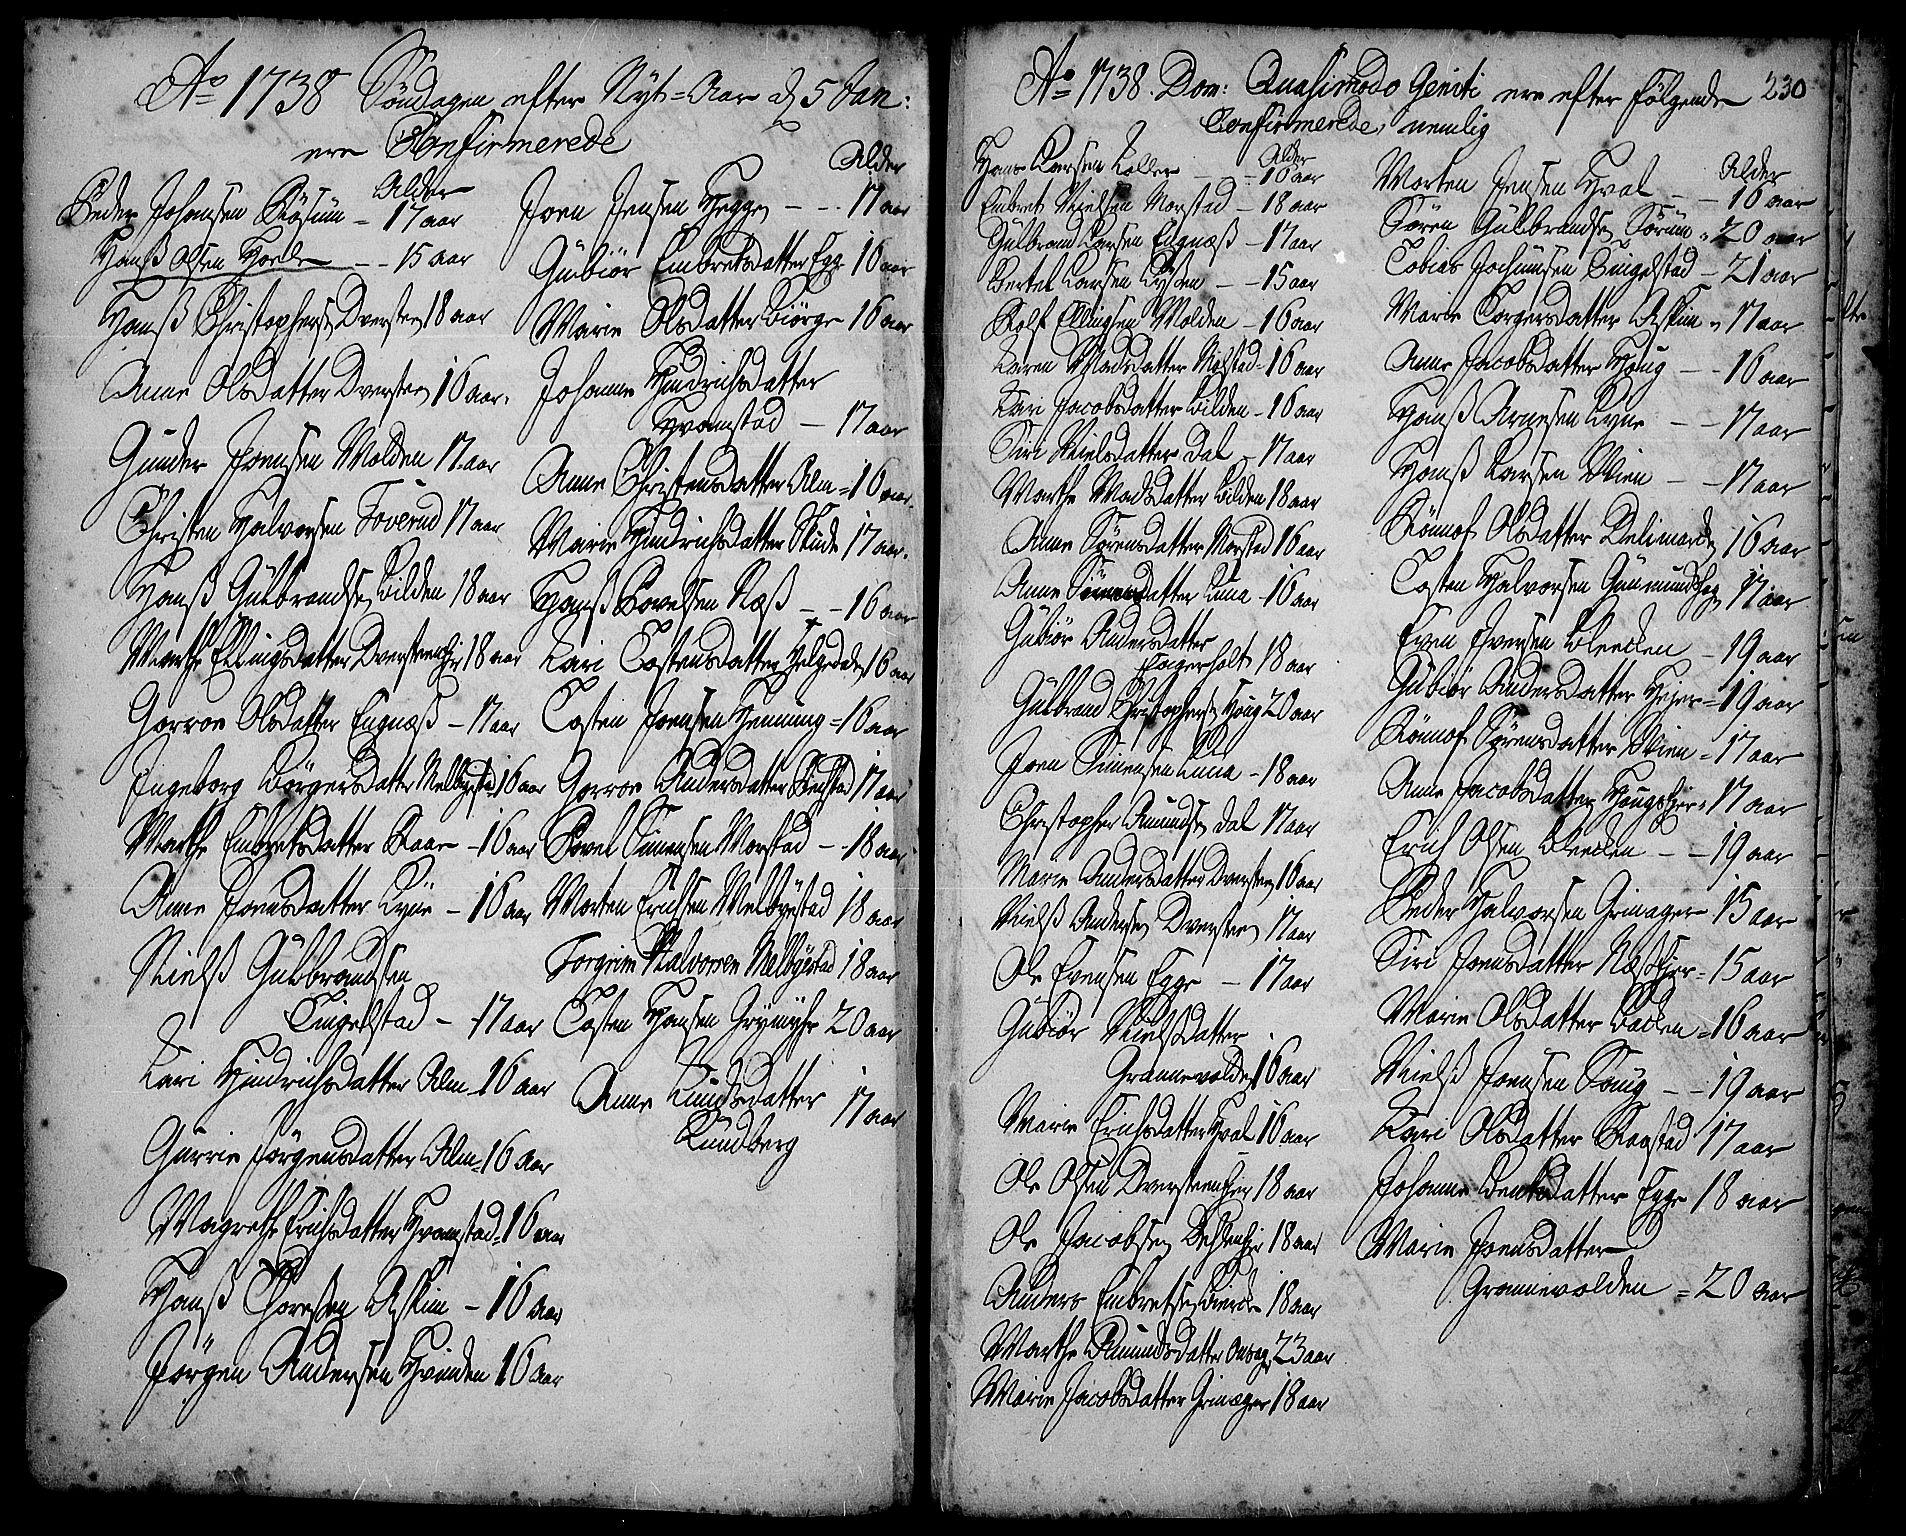 SAH, Gran prestekontor, Ministerialbok nr. 2, 1732-1744, s. 230